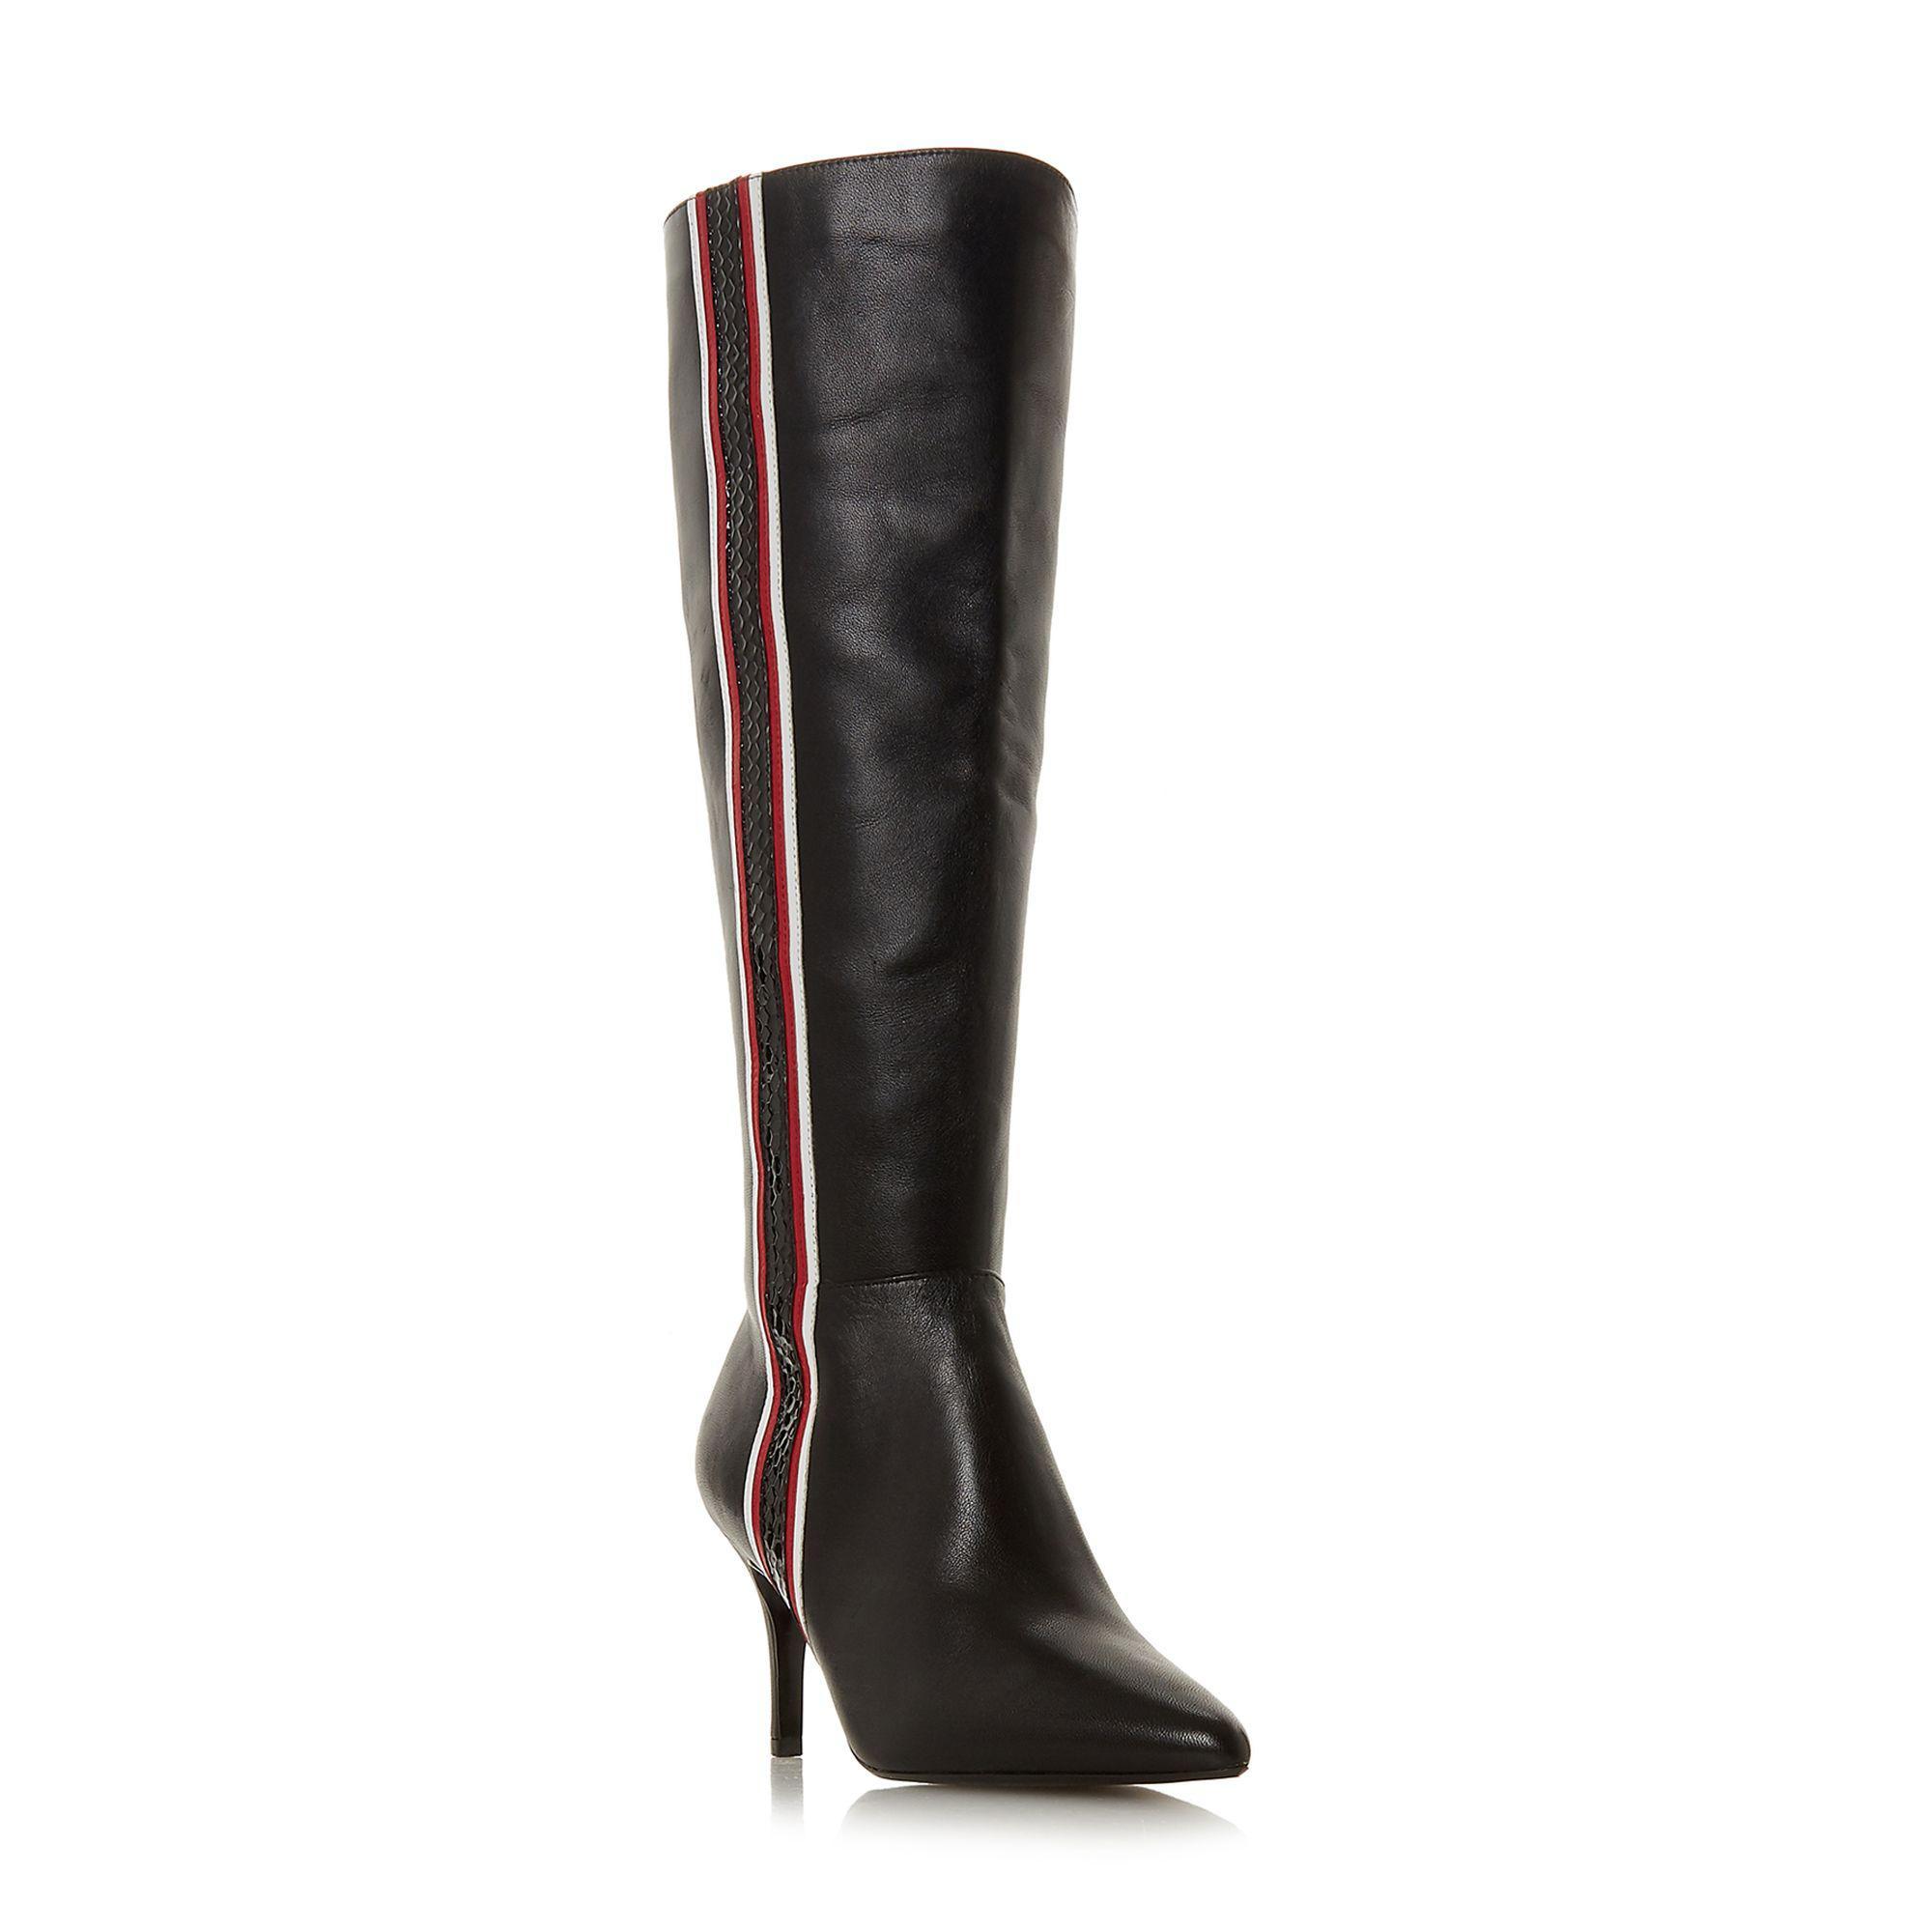 501a7398c84 Dune. Women s Black Leather  siesta  Mid Stiletto Heel Knee High Boots